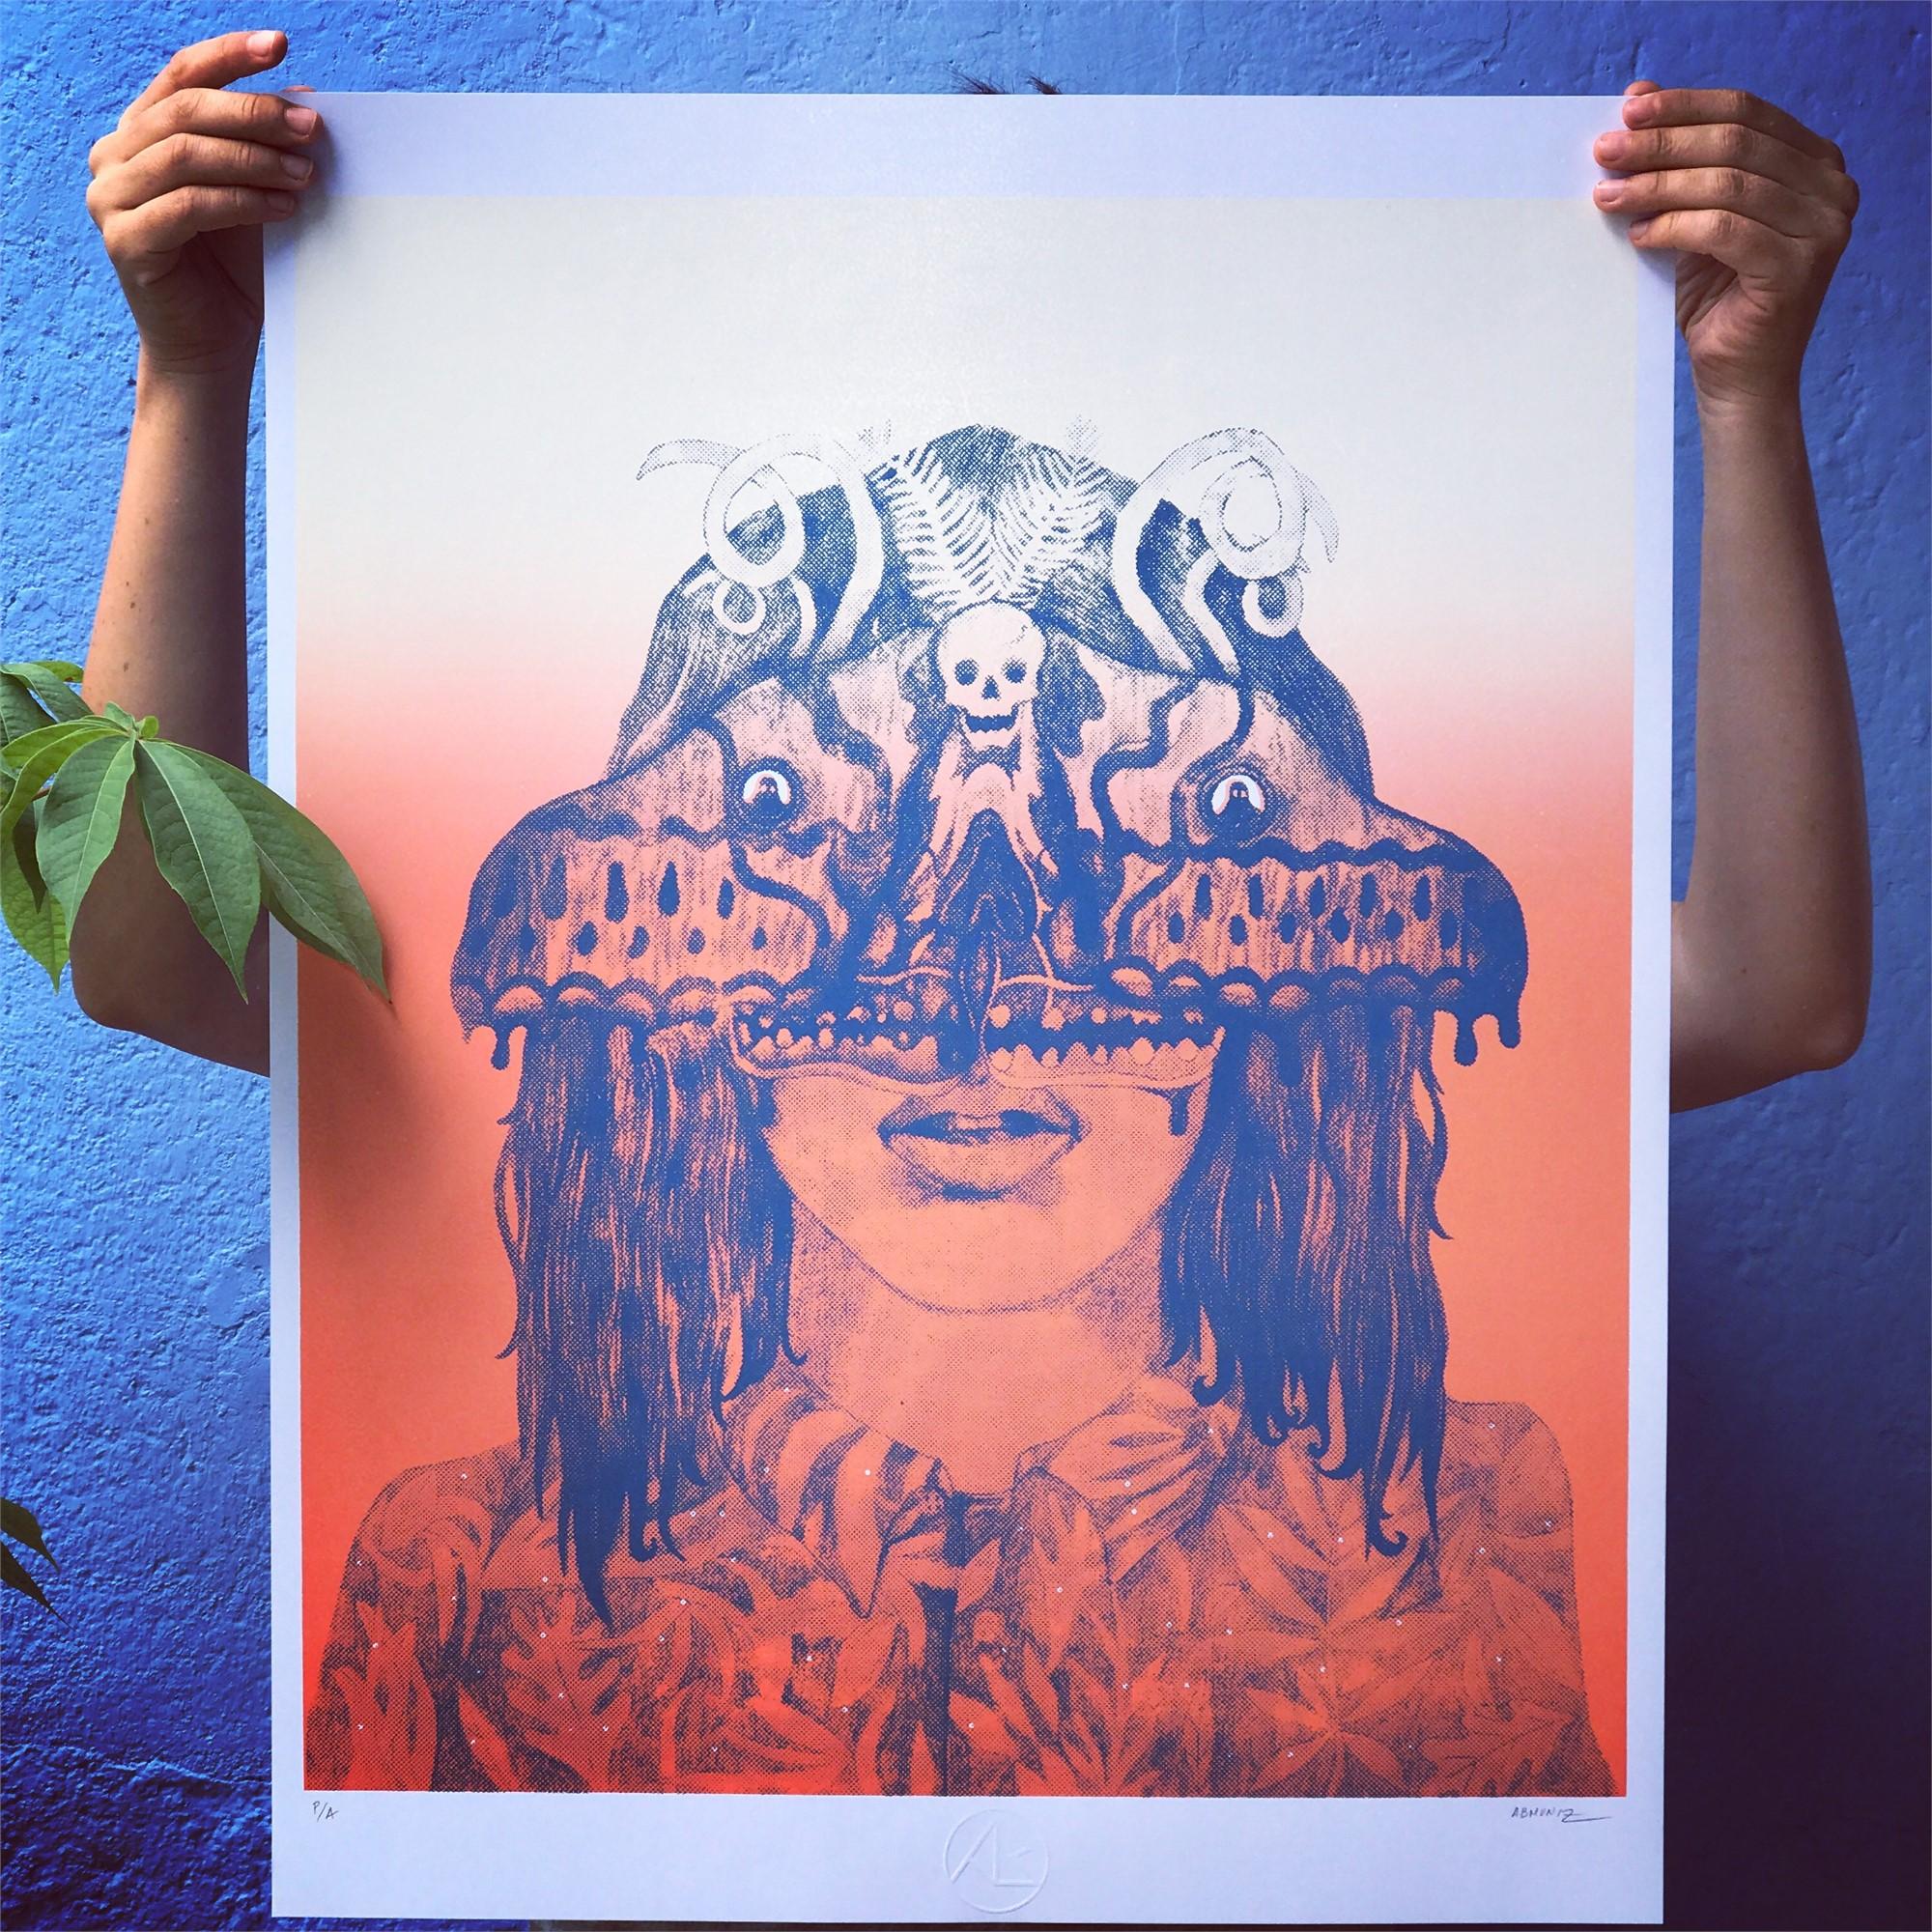 Mujer Polilla (Framed) by Alfonso Barrera